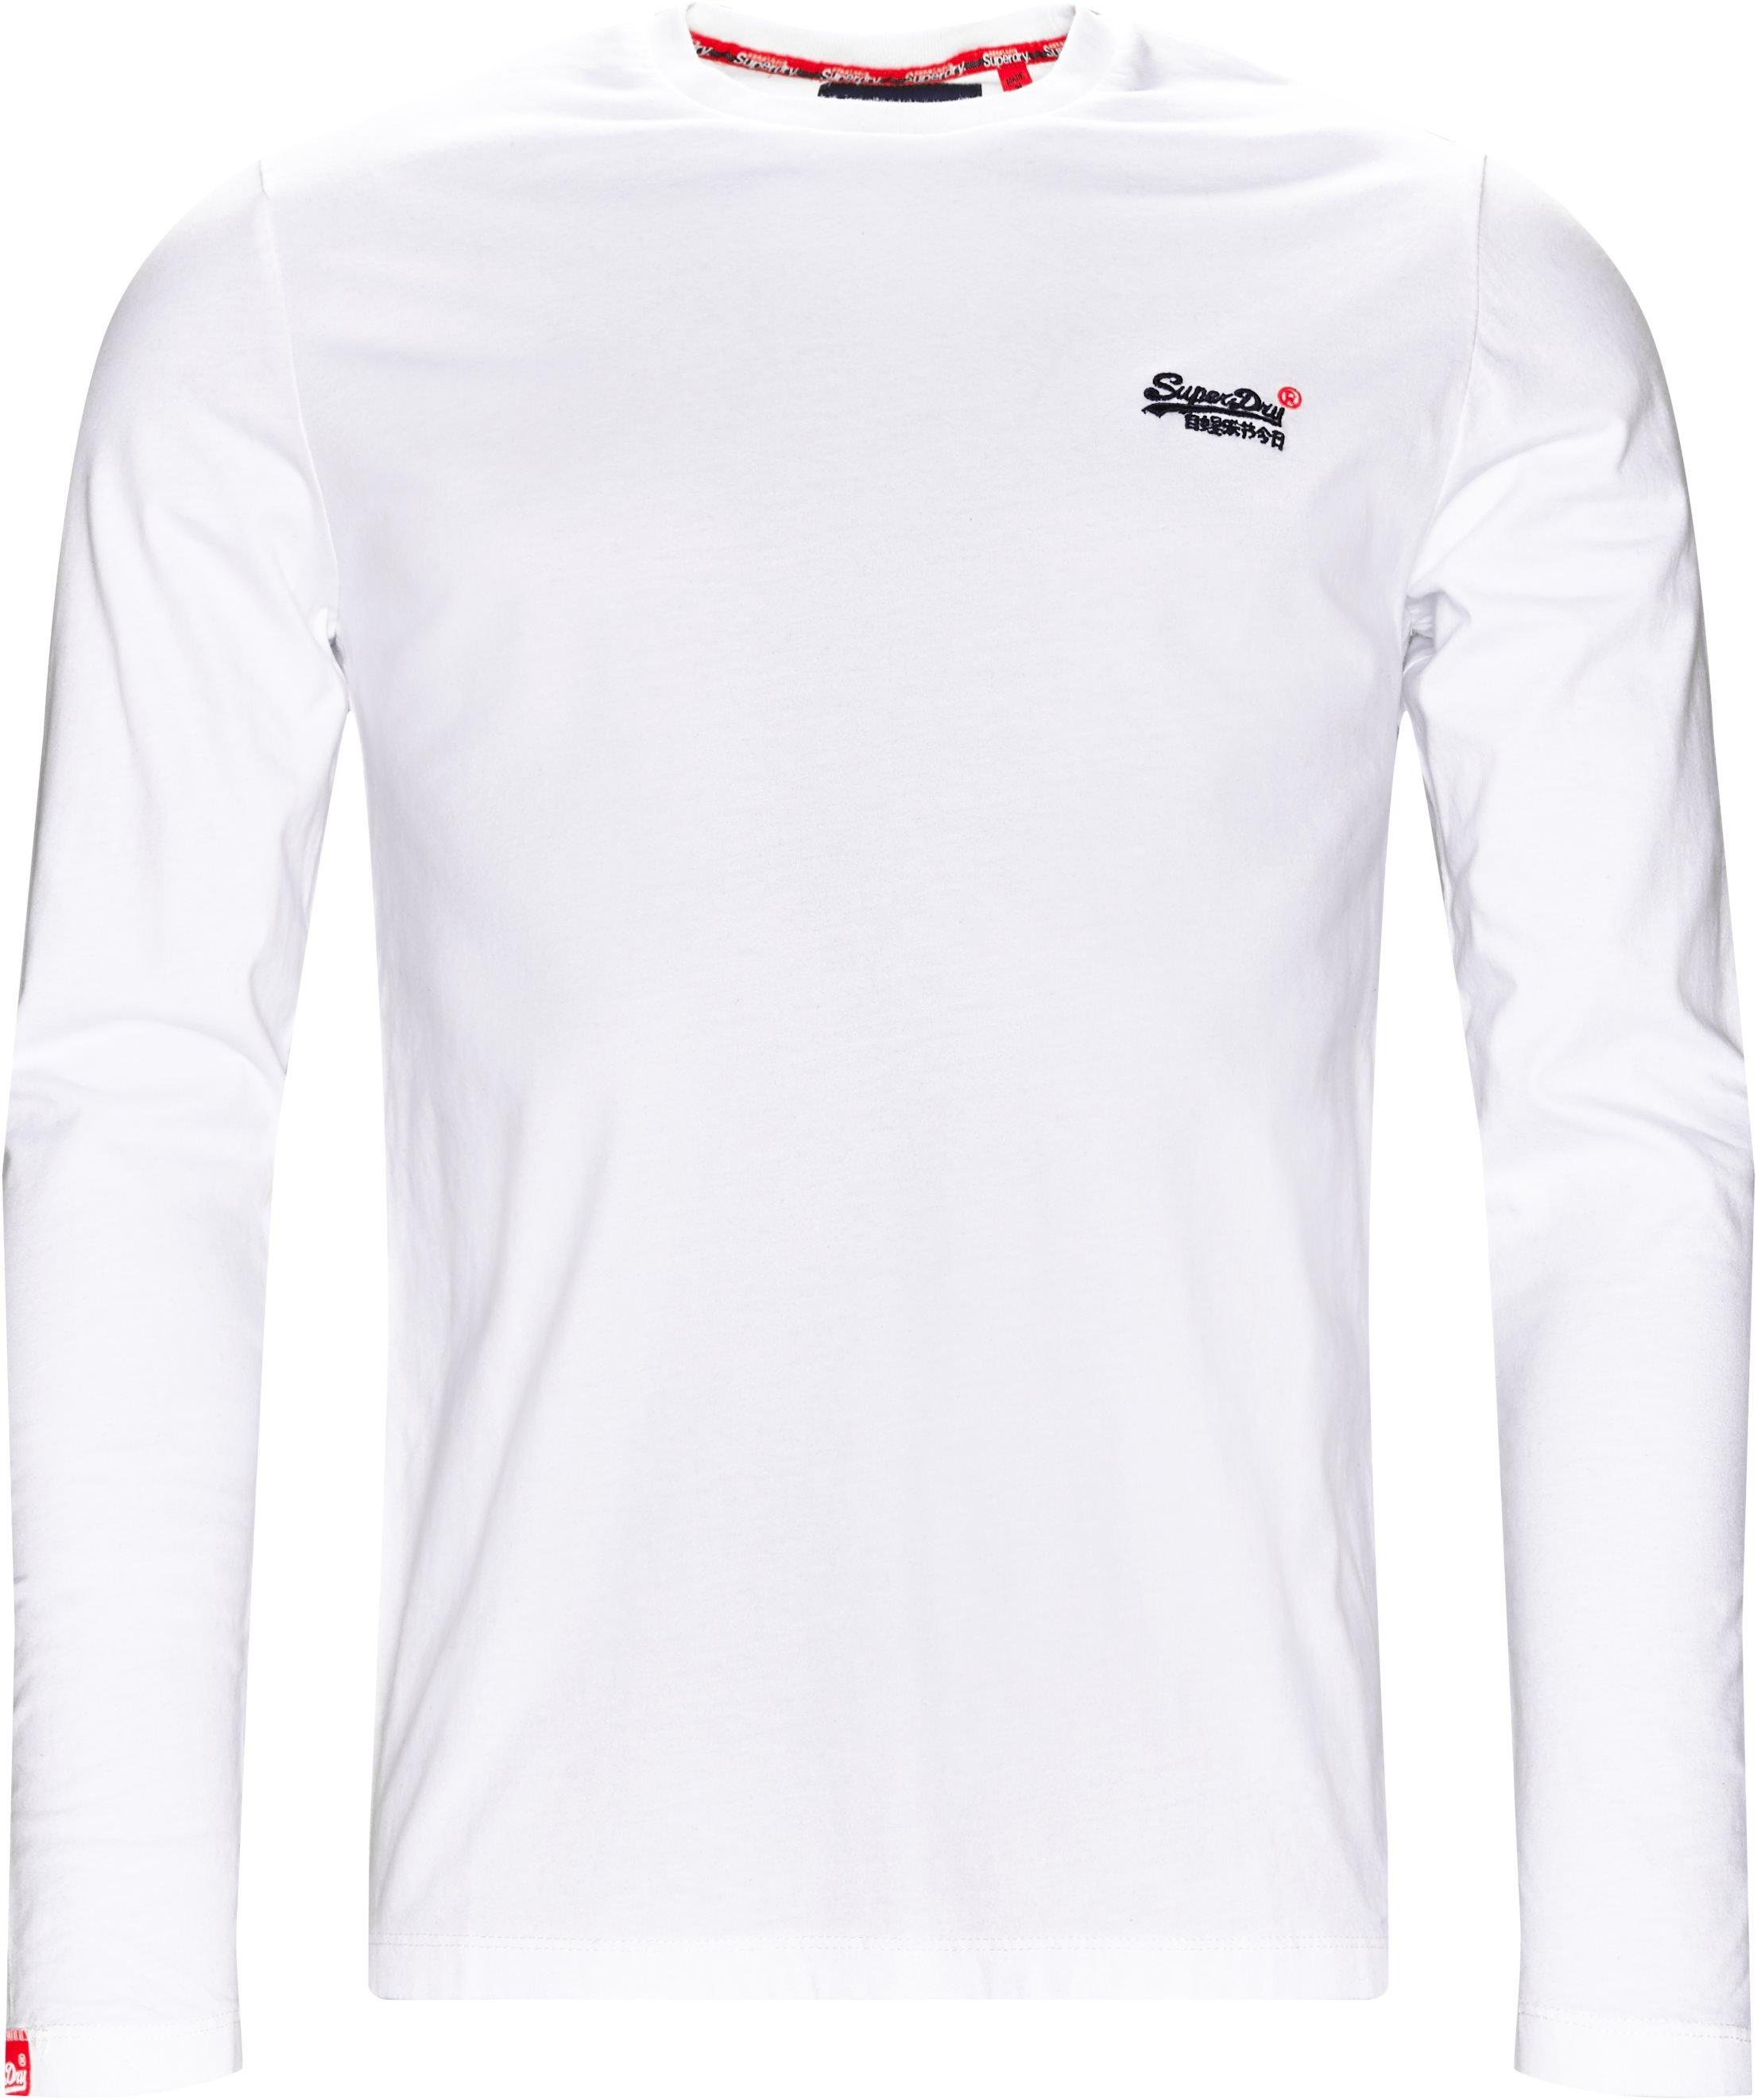 M6000 LS Tee - T-shirts - Regular fit - Hvid